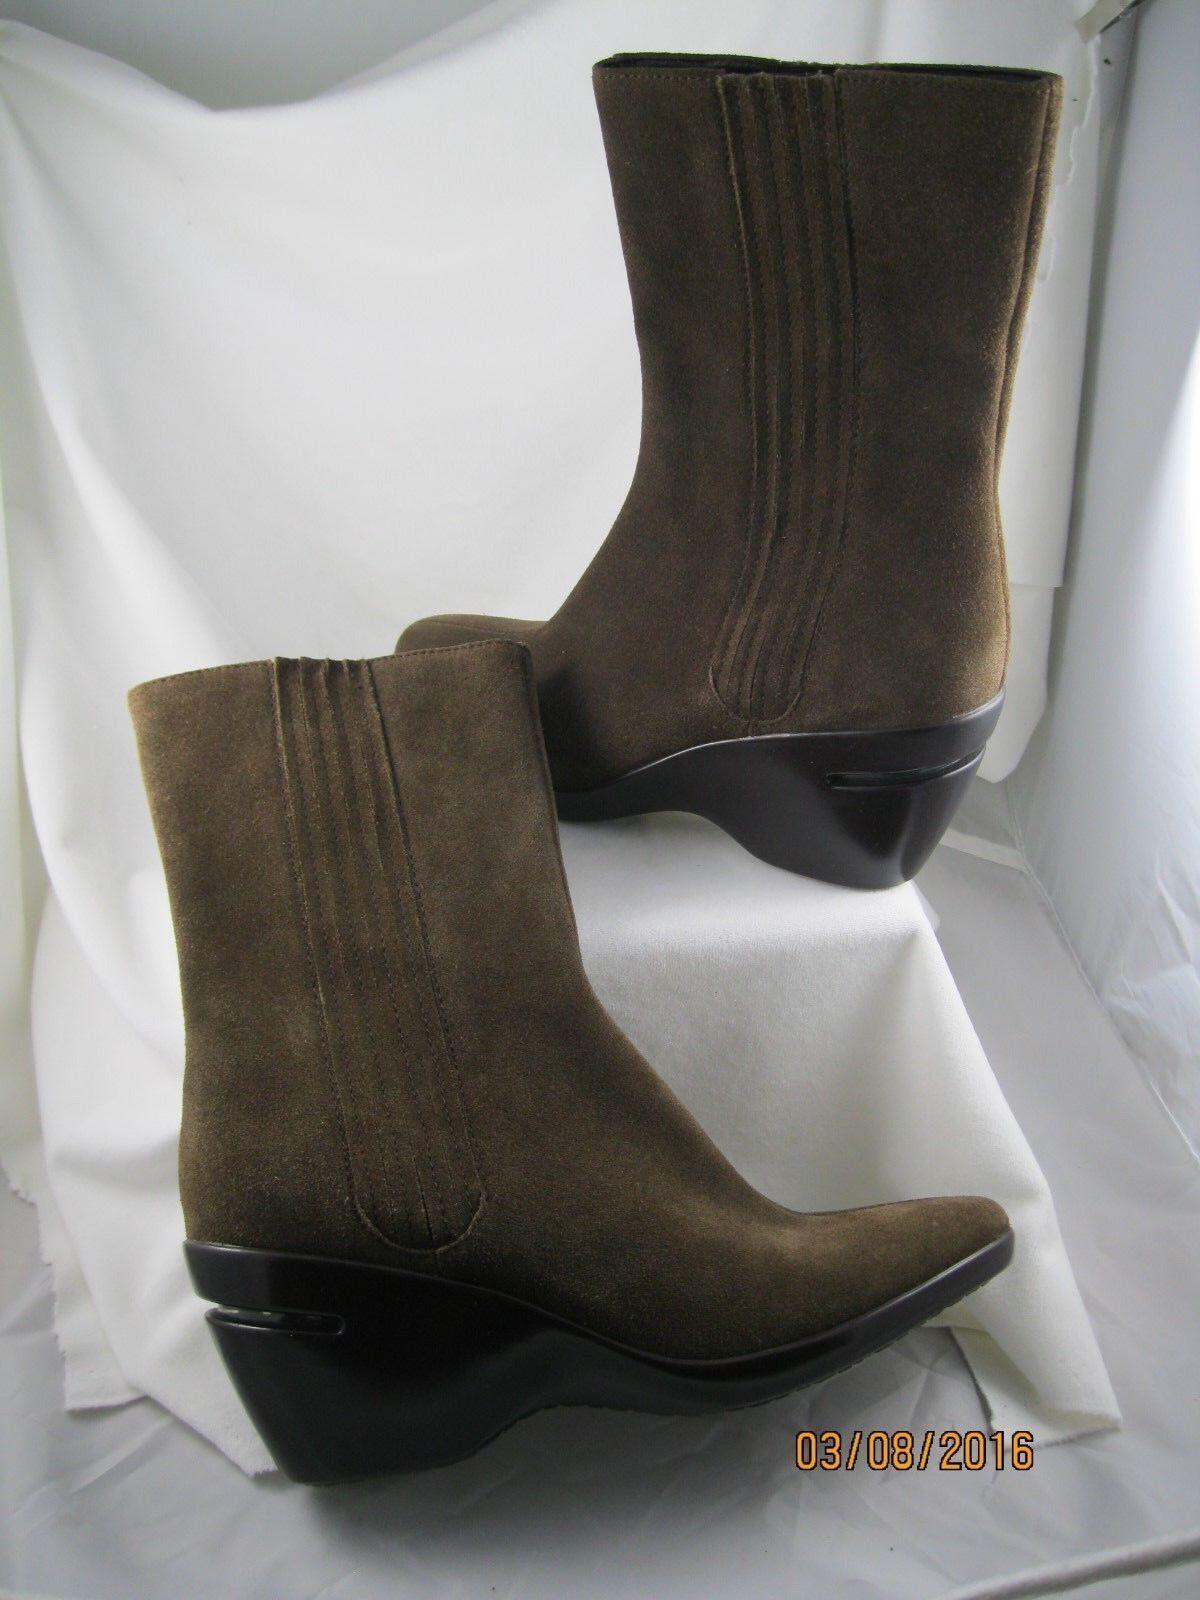 COLE HAAN NEIMAN MARCUS DARK TAUPE/BROWN SUEDE MID-CALF BOOTS- NEVER WORN - 8.5B